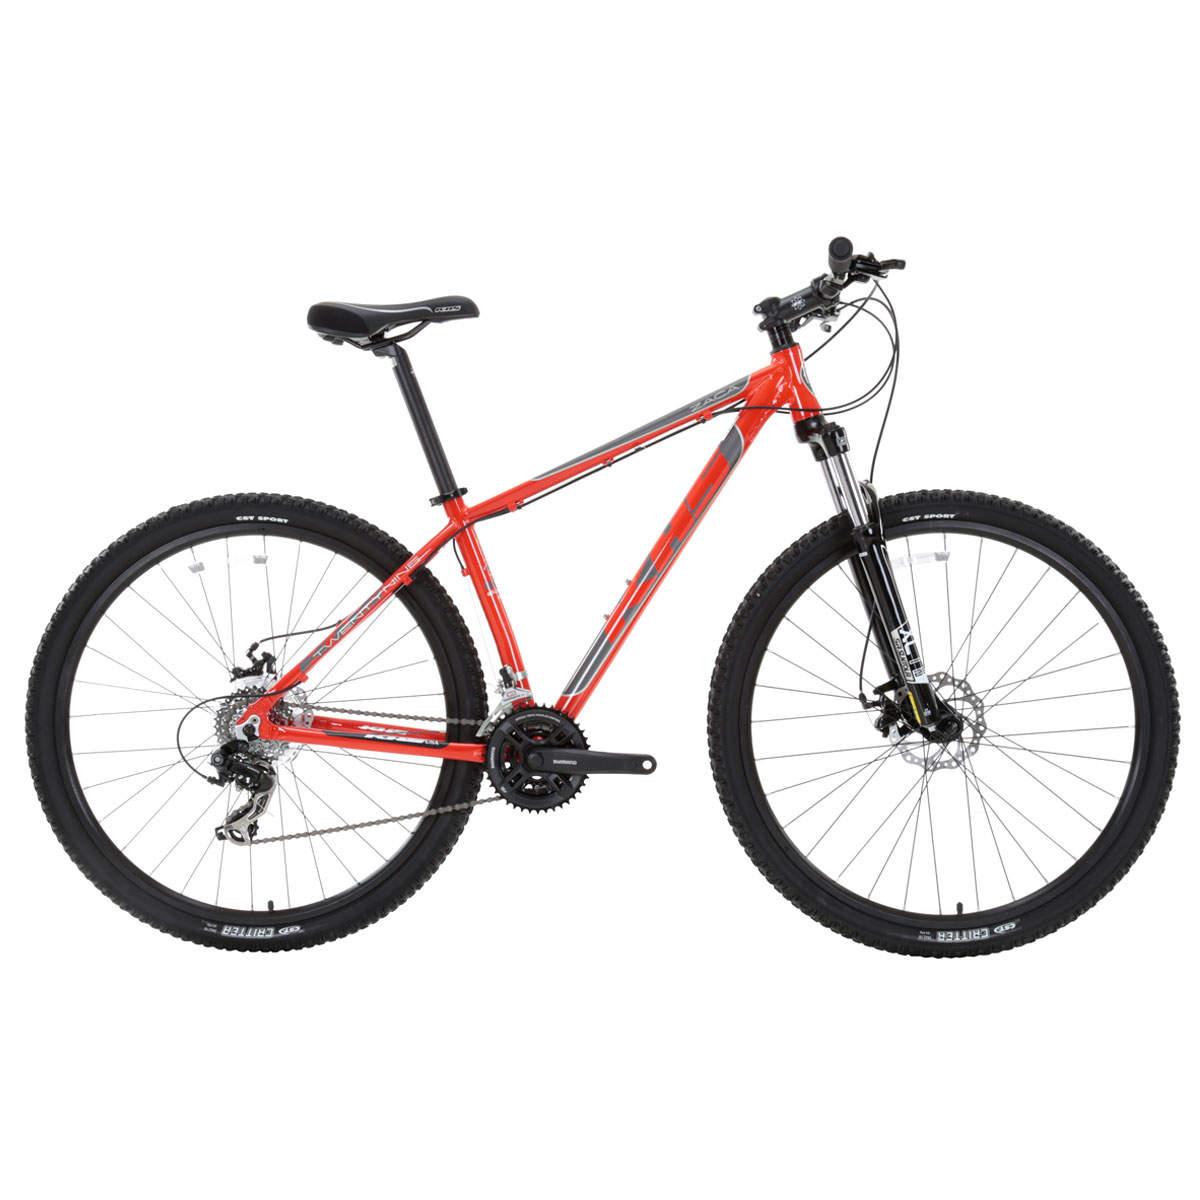 Bicicleta Khs Bike Zaca Tp Aro 29 Susp. Dianteira 21 Marchas - Preto